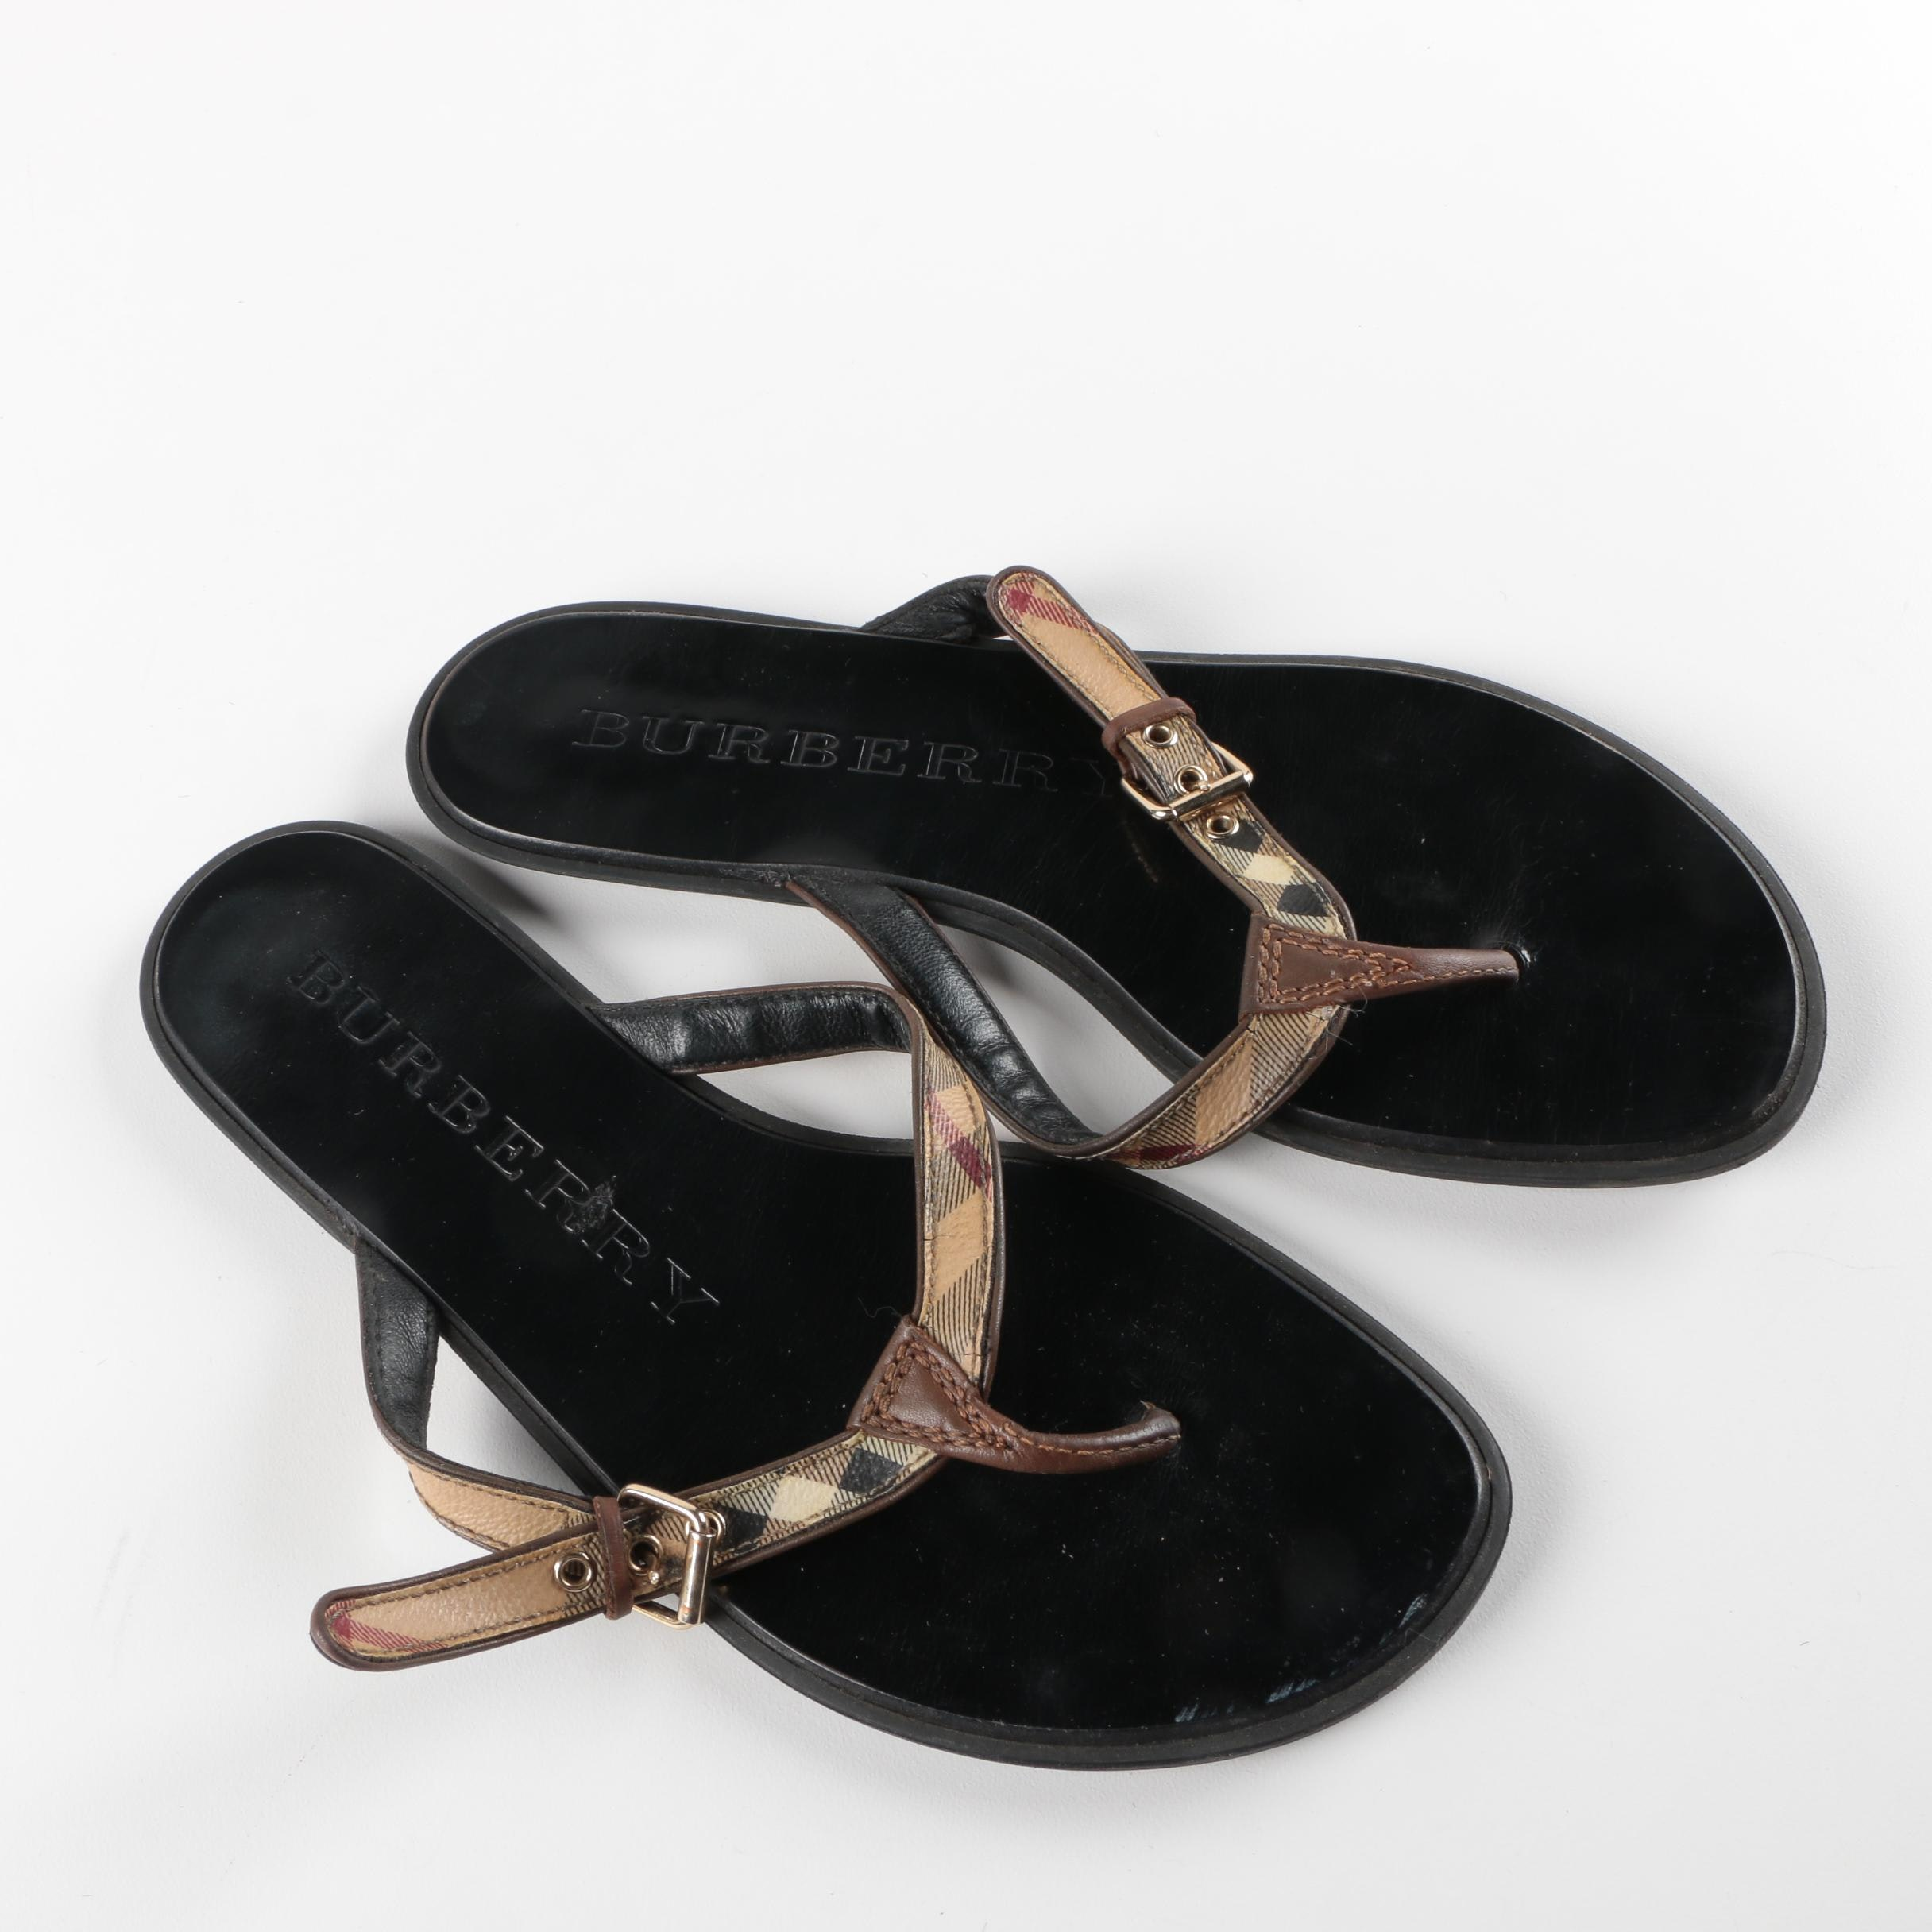 Burberry Parsons Leather Flip Flops